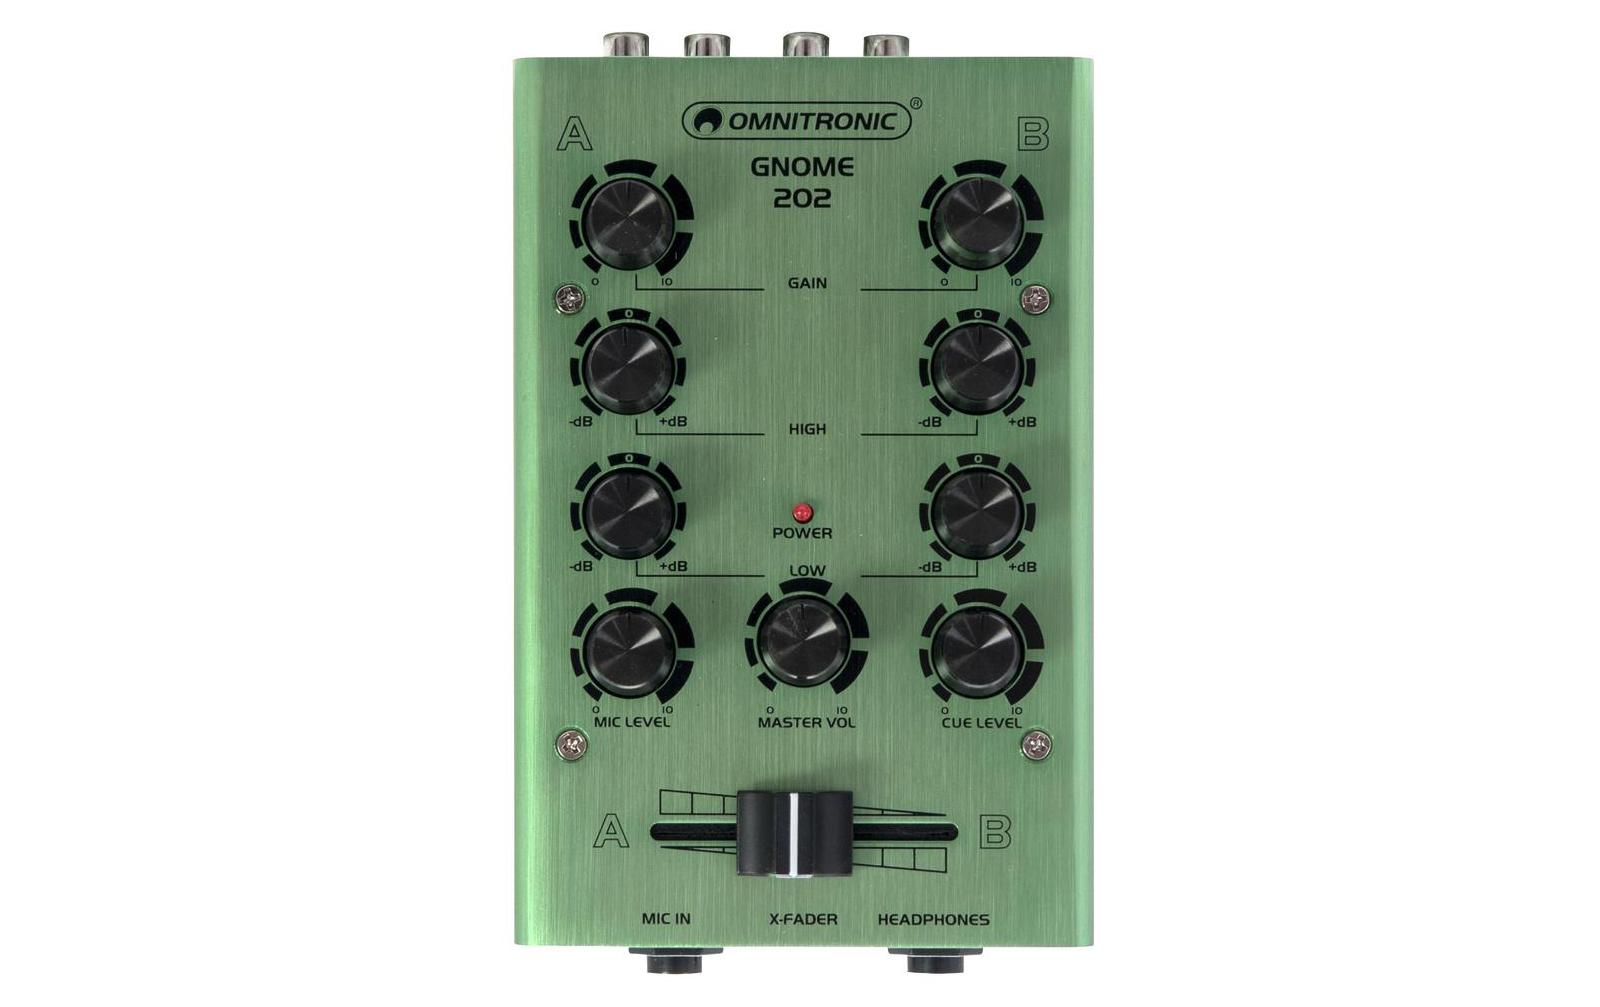 omnitronic-gnome-202-mini-mixer-gra-n